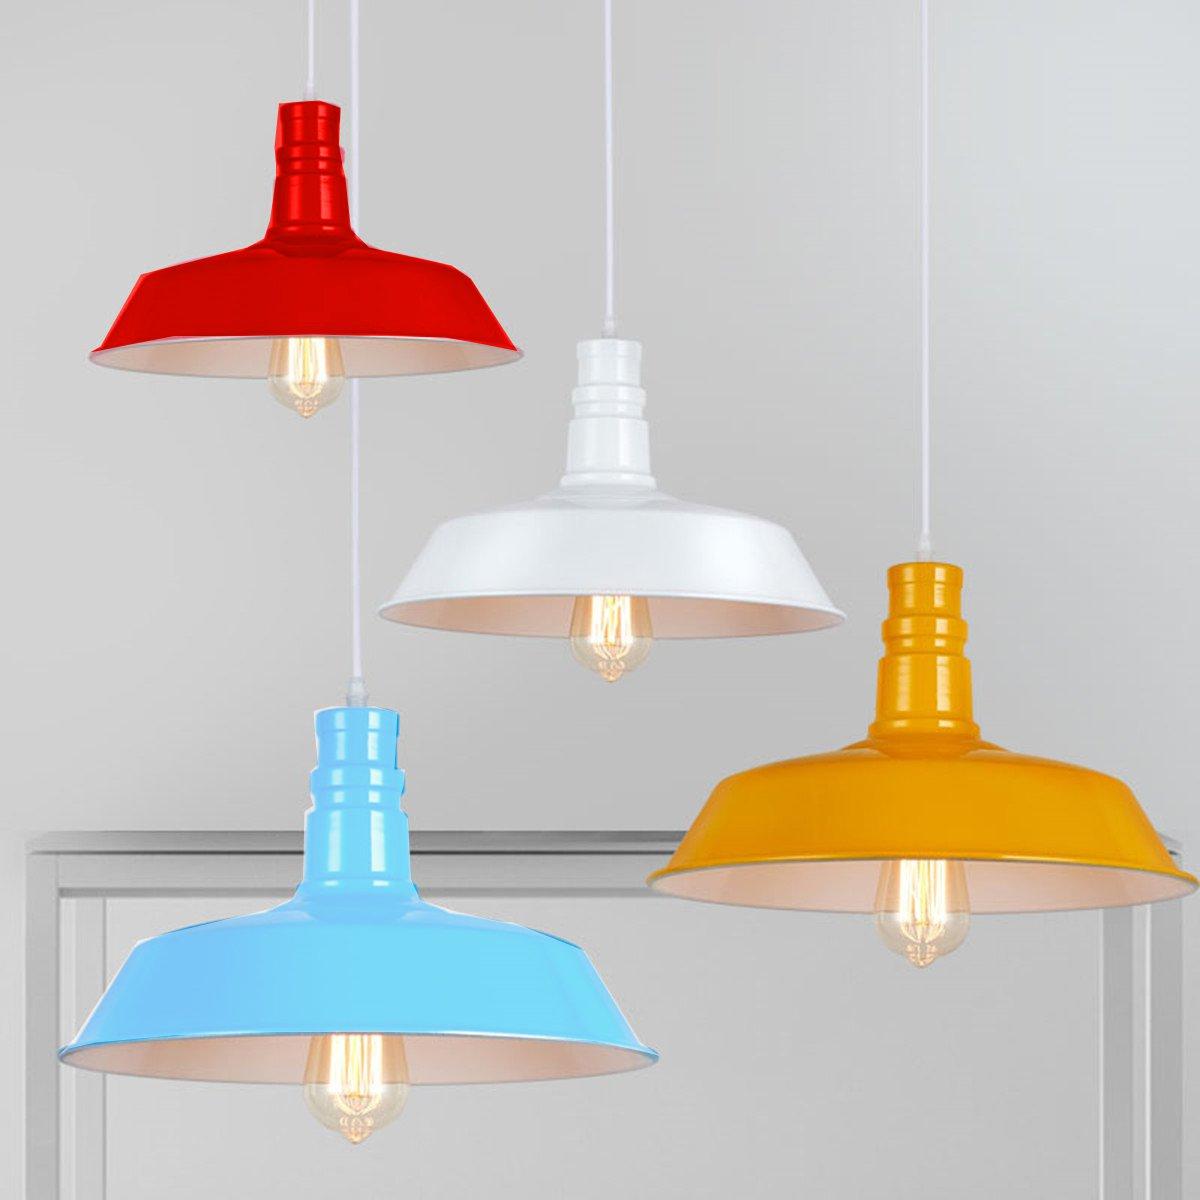 Modern Vintage Retro 36cm Iron Metal Lamp Fixture Pendant Light Lampshade Bar Coffee Shop Kitchen Fitting Lamp Cover